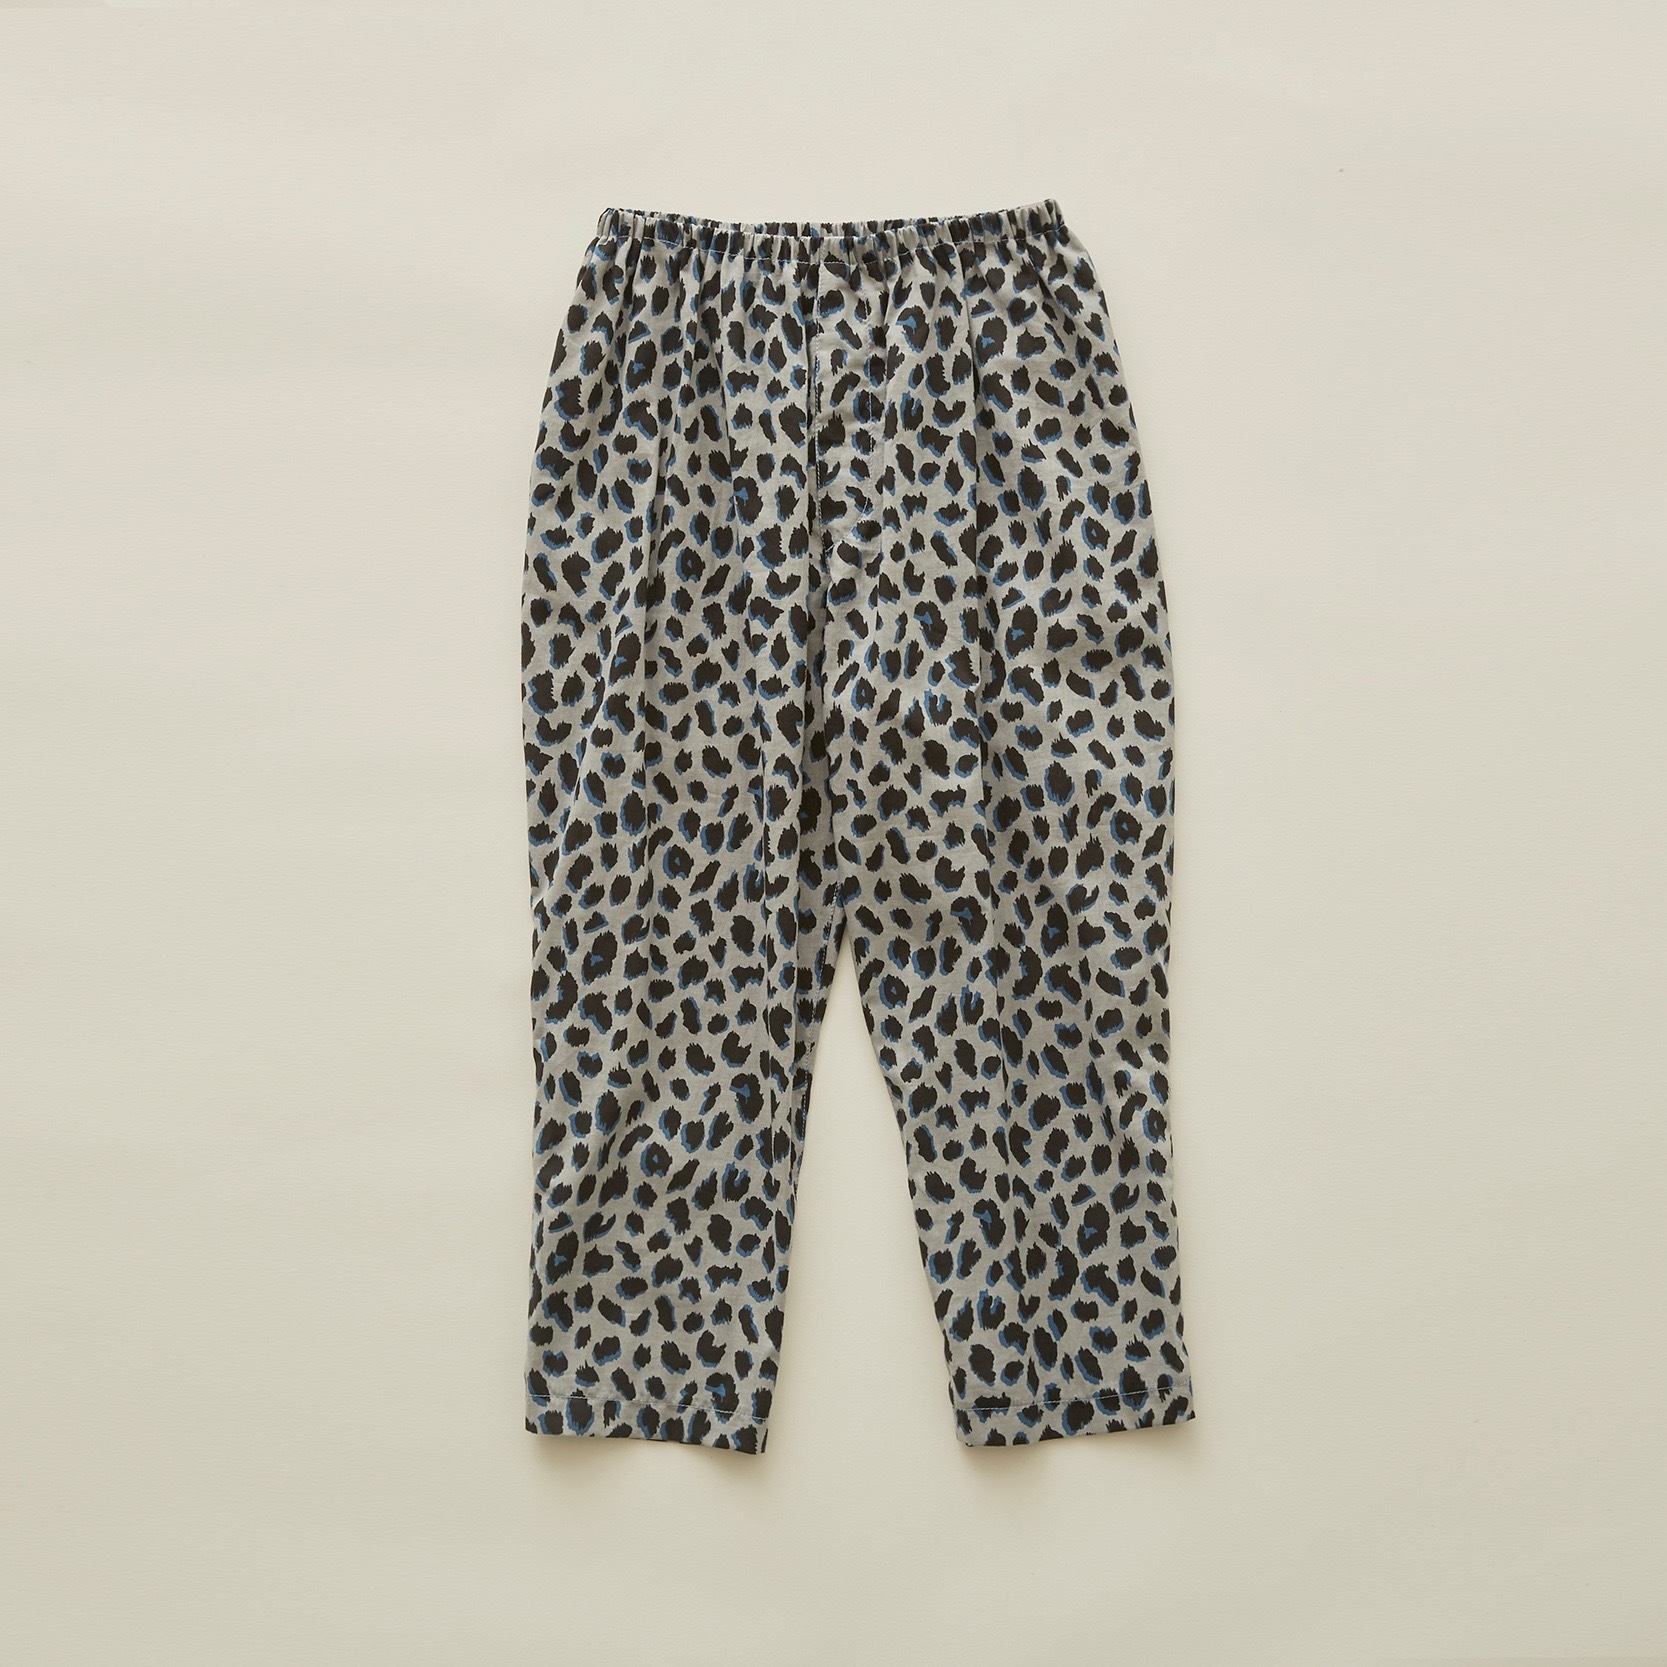 《eLfinFolk 2020SS》leopard pants / gray / 80-100cm